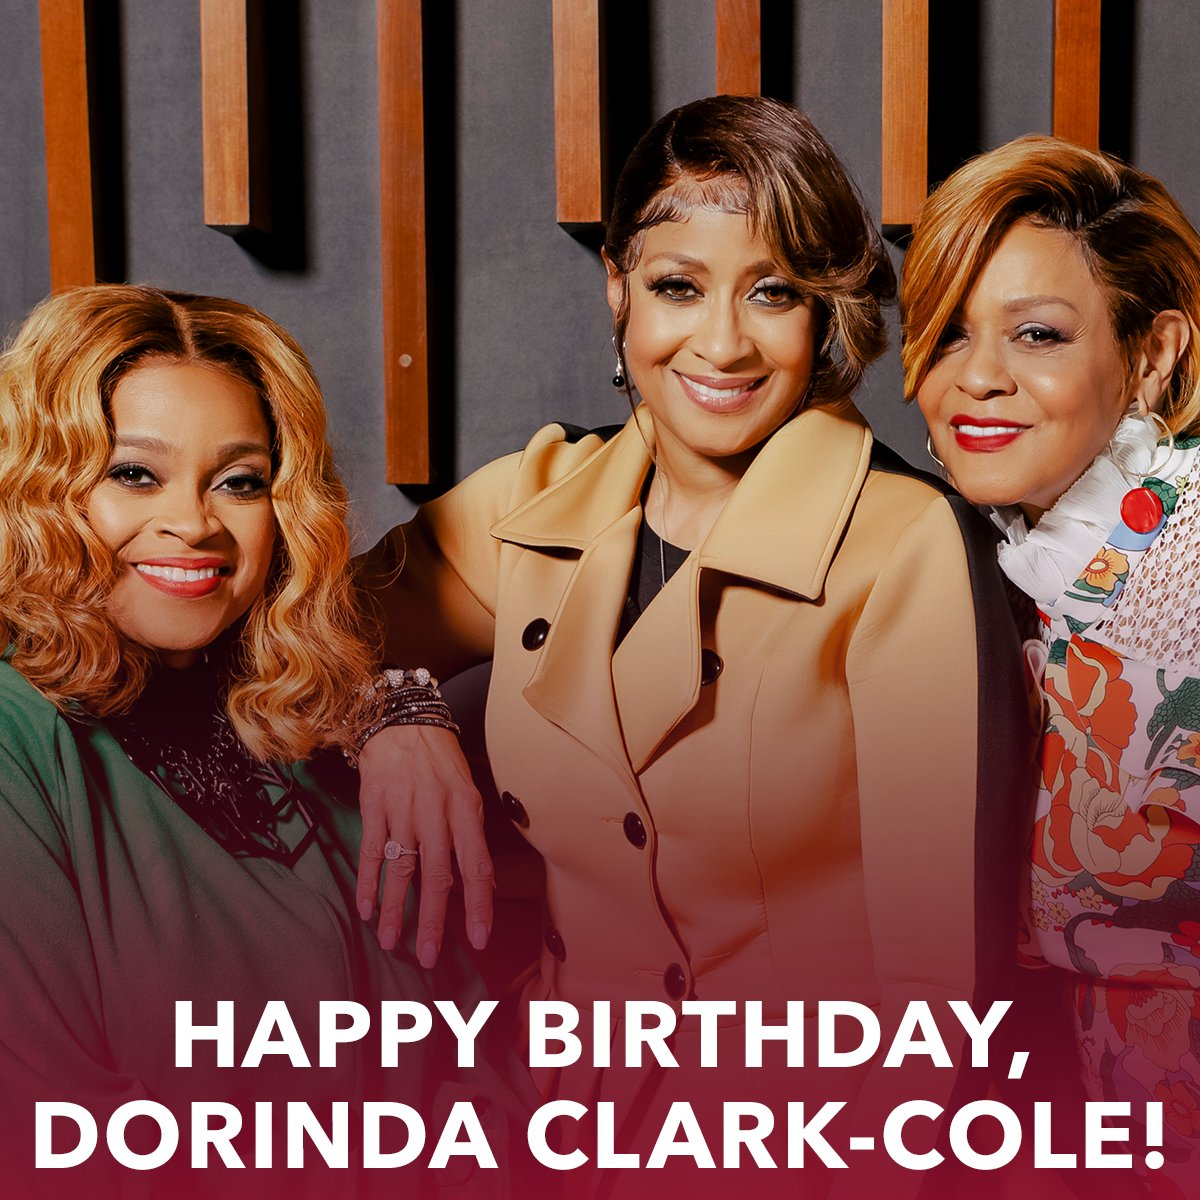 Help us wish @DorindaTheRose a very Happy Birthday! #TheClarkSisters 💗 https://t.co/XqFb5iXI75